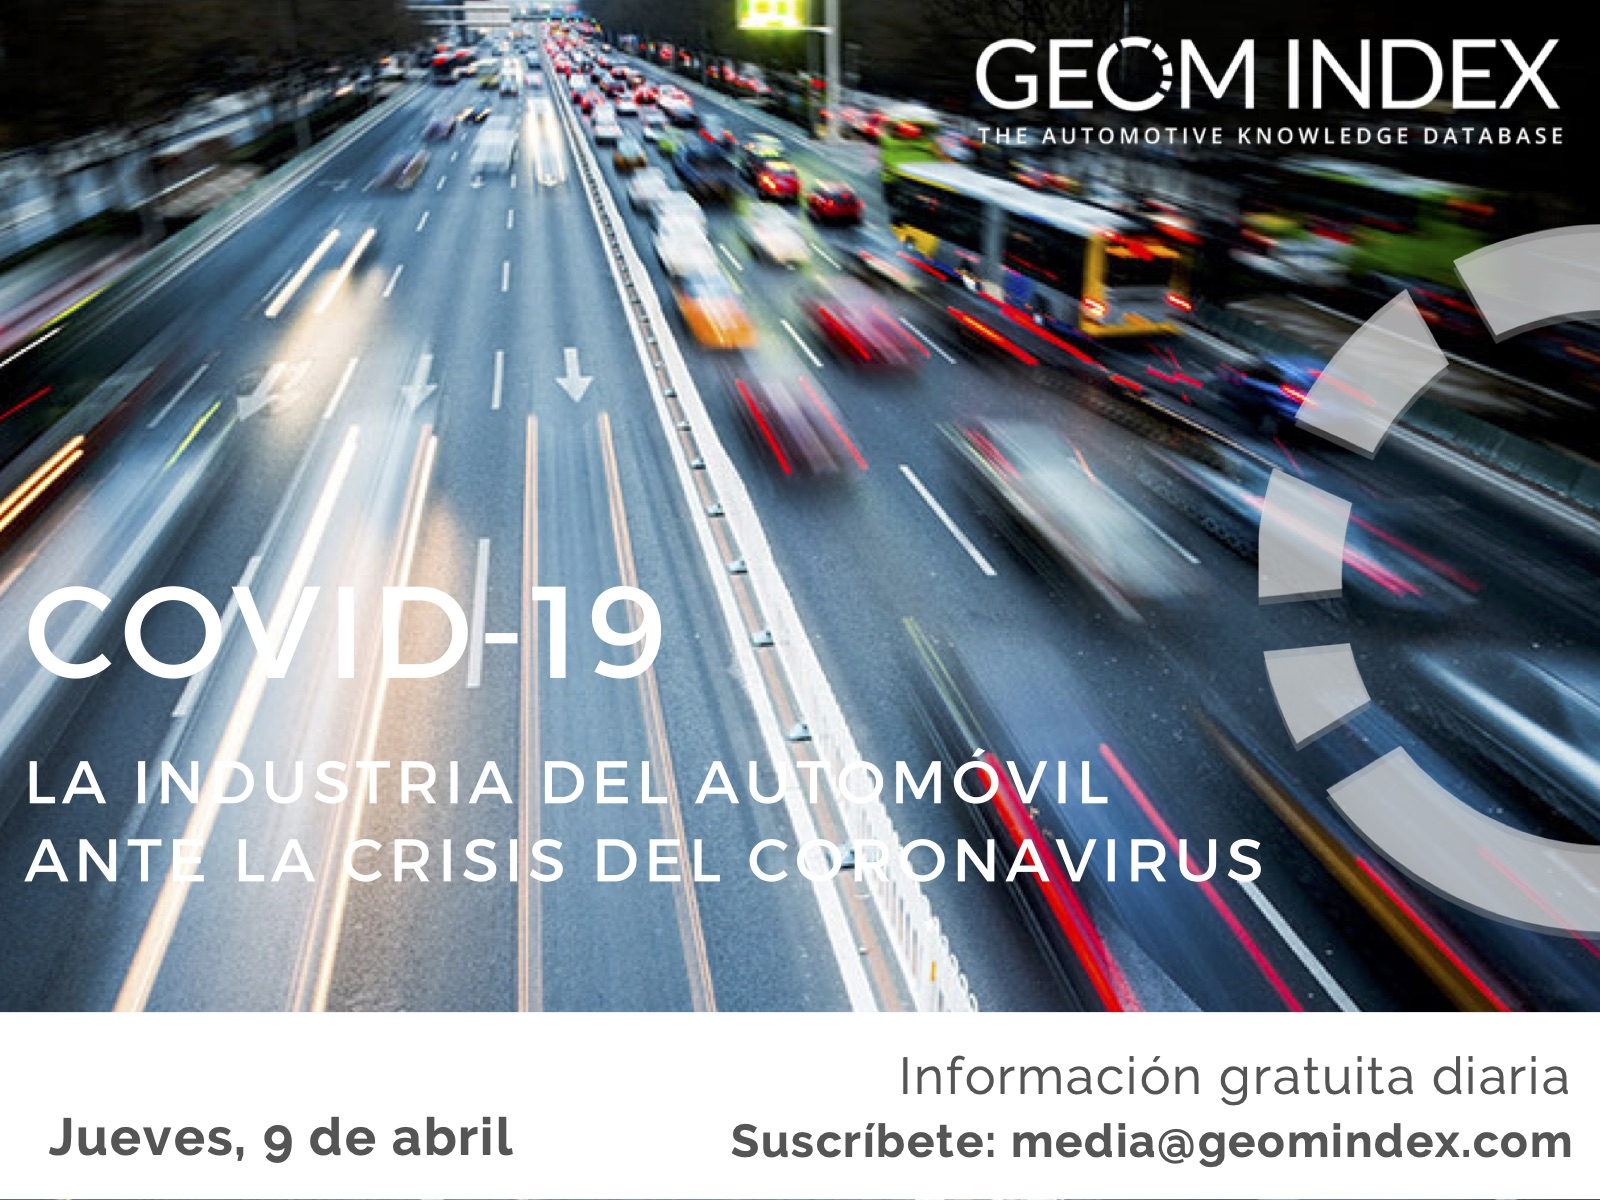 Informe 9 de abril – La industria del automóvil ante la crisis del Covid-19